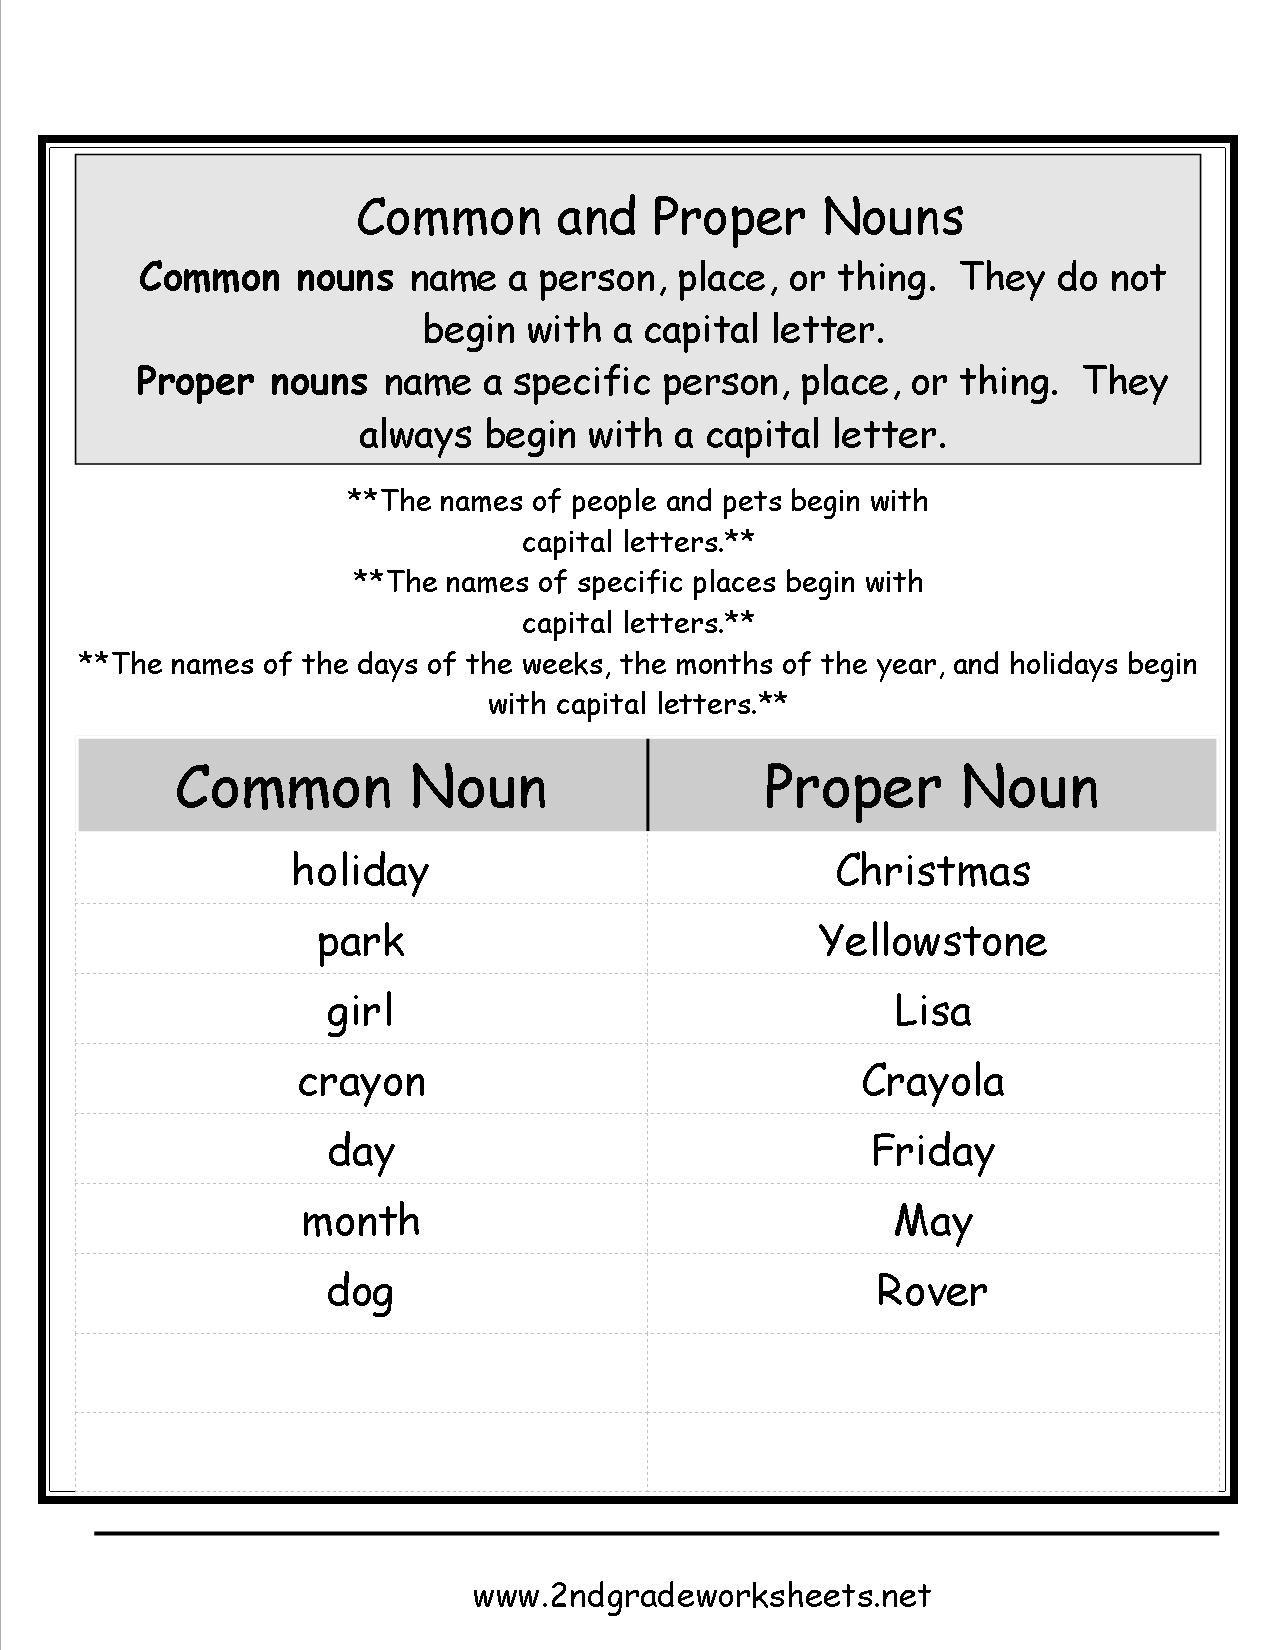 2nd Grade Proper Nouns Worksheet Mon and Proper Nouns Worksheet